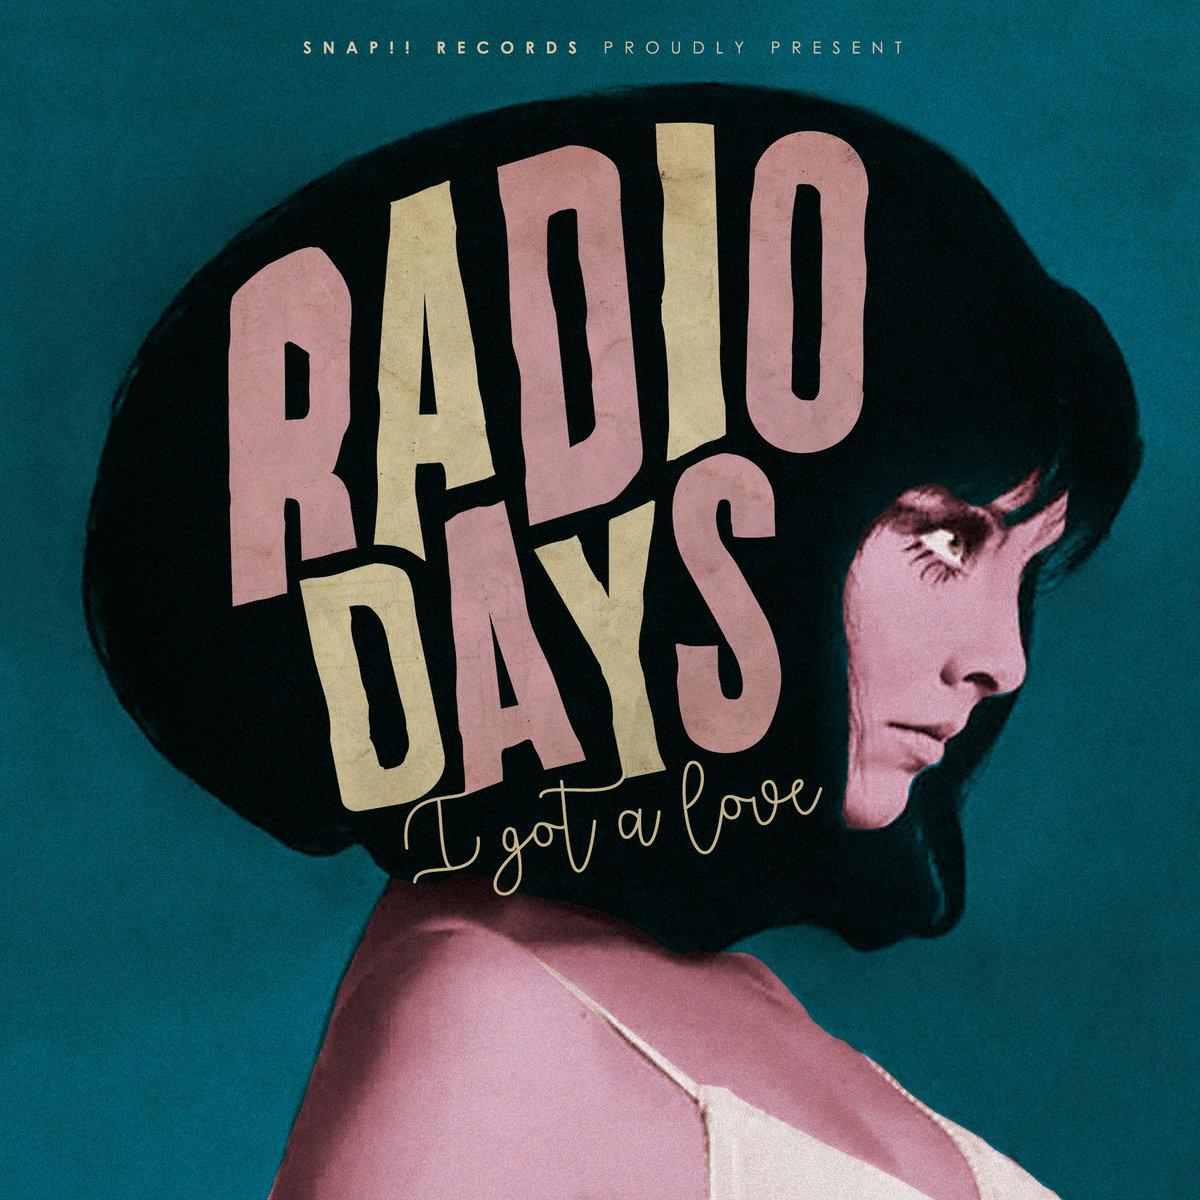 Radio Days y su single con videoclip 'I got a love'